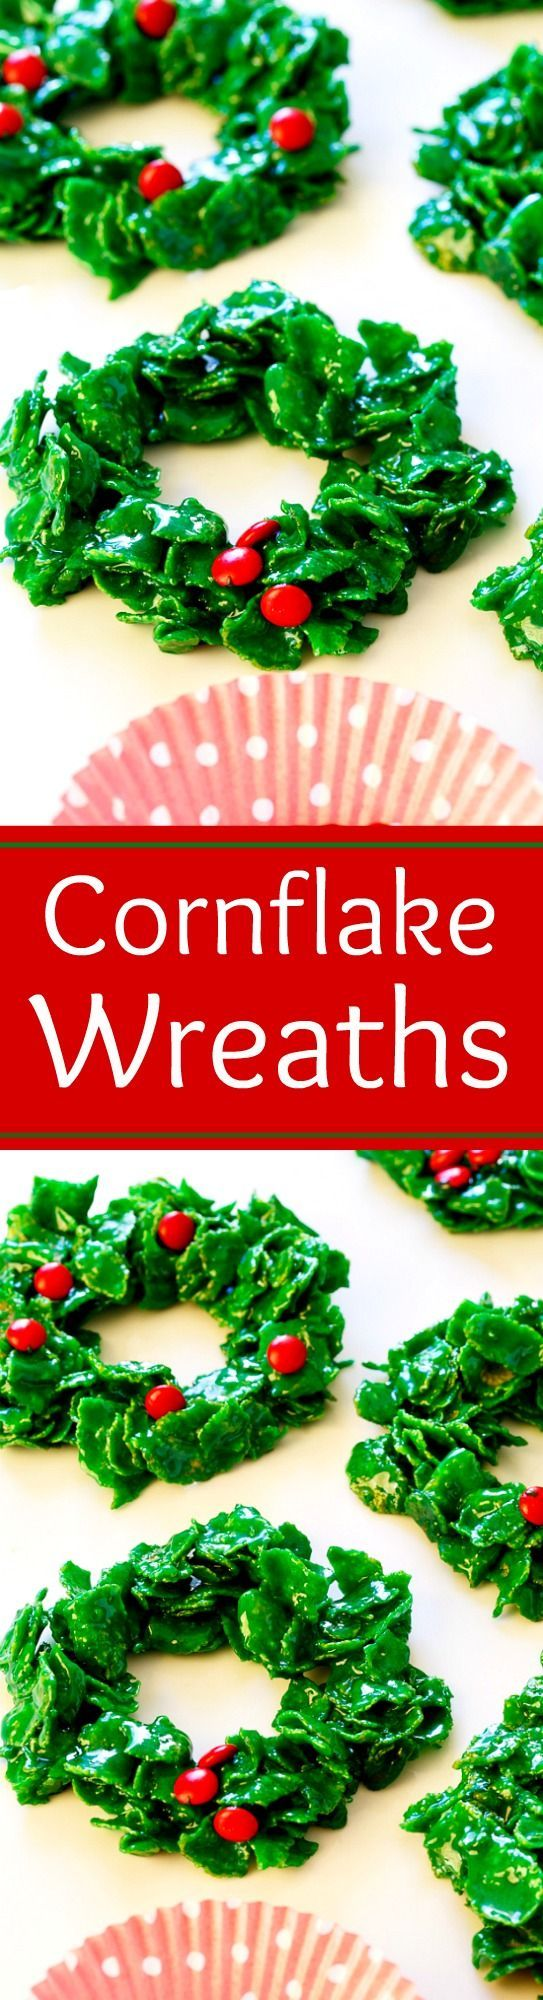 recipe: cornflake wreaths recipe [35]